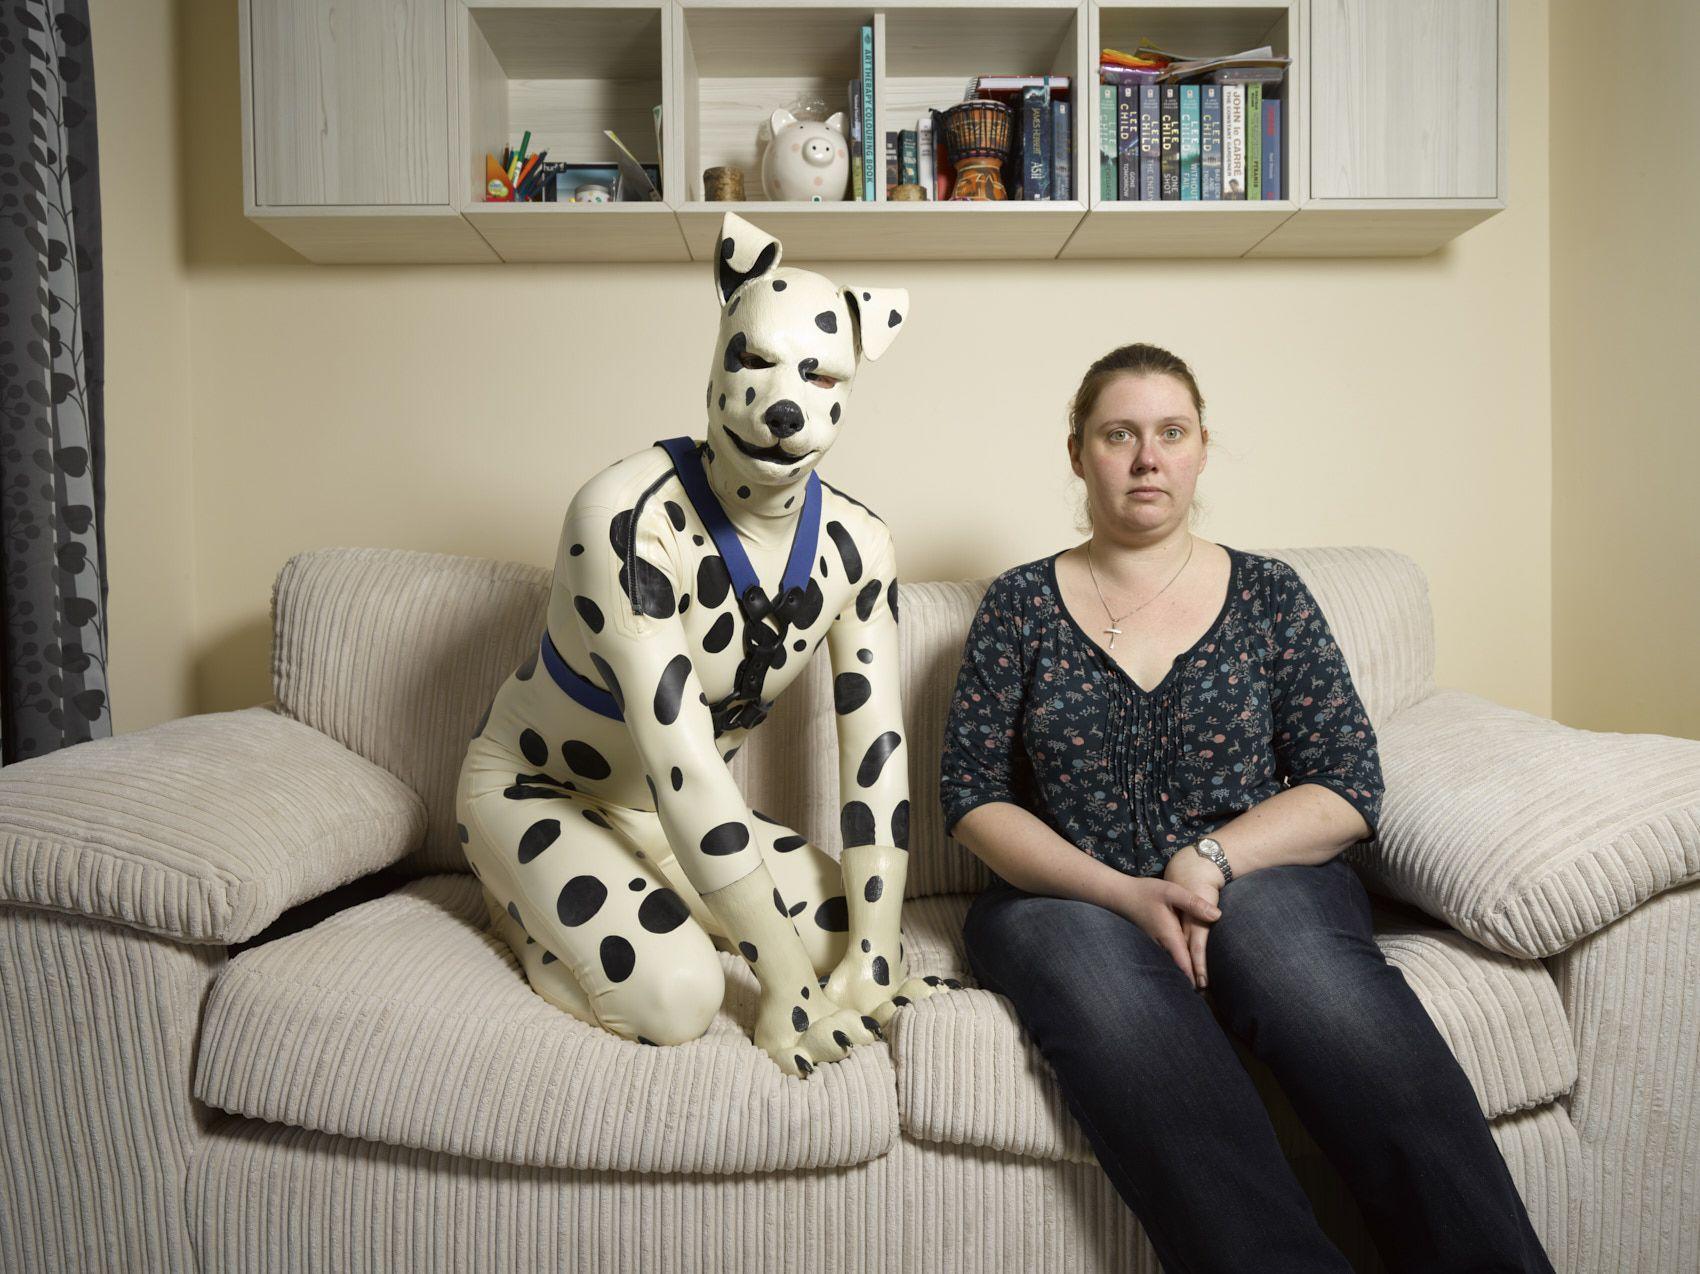 Spot (L), aka Tom, and his ex-fiancee Rachael